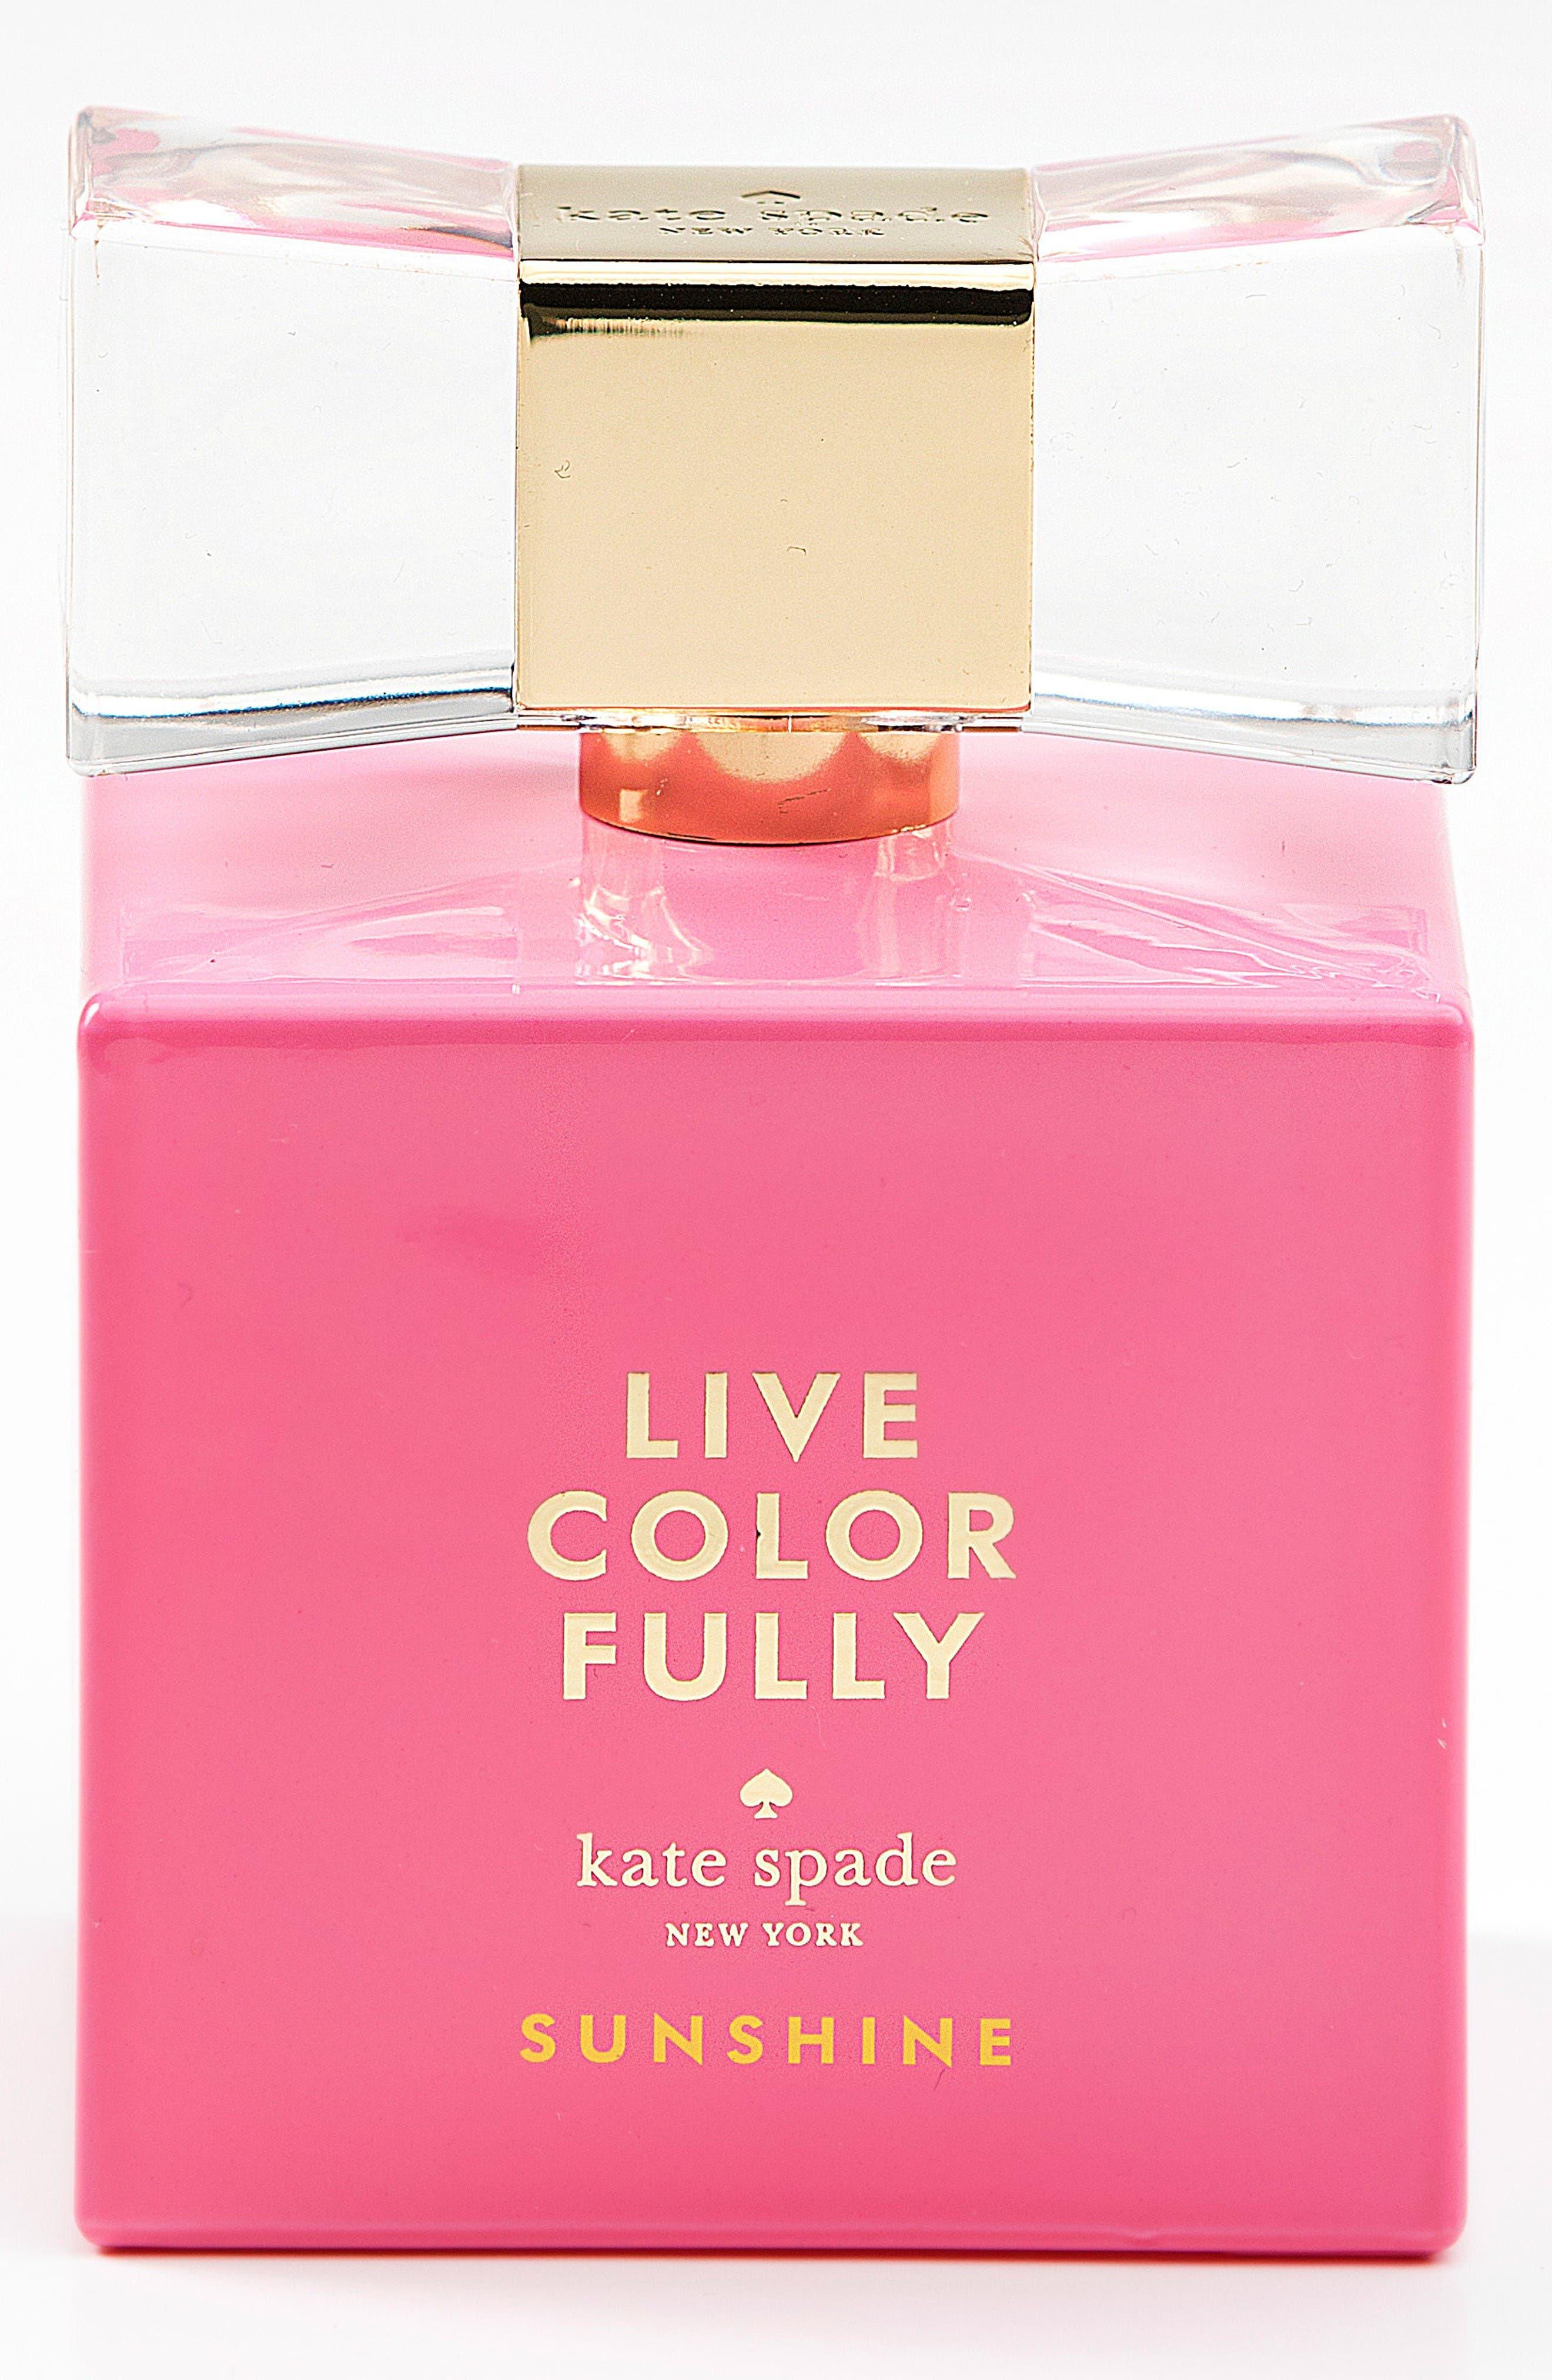 Alternate Image 1 Selected - kate spade new york 'live colorfully sunshine' eau de parfum (Limited Edition)